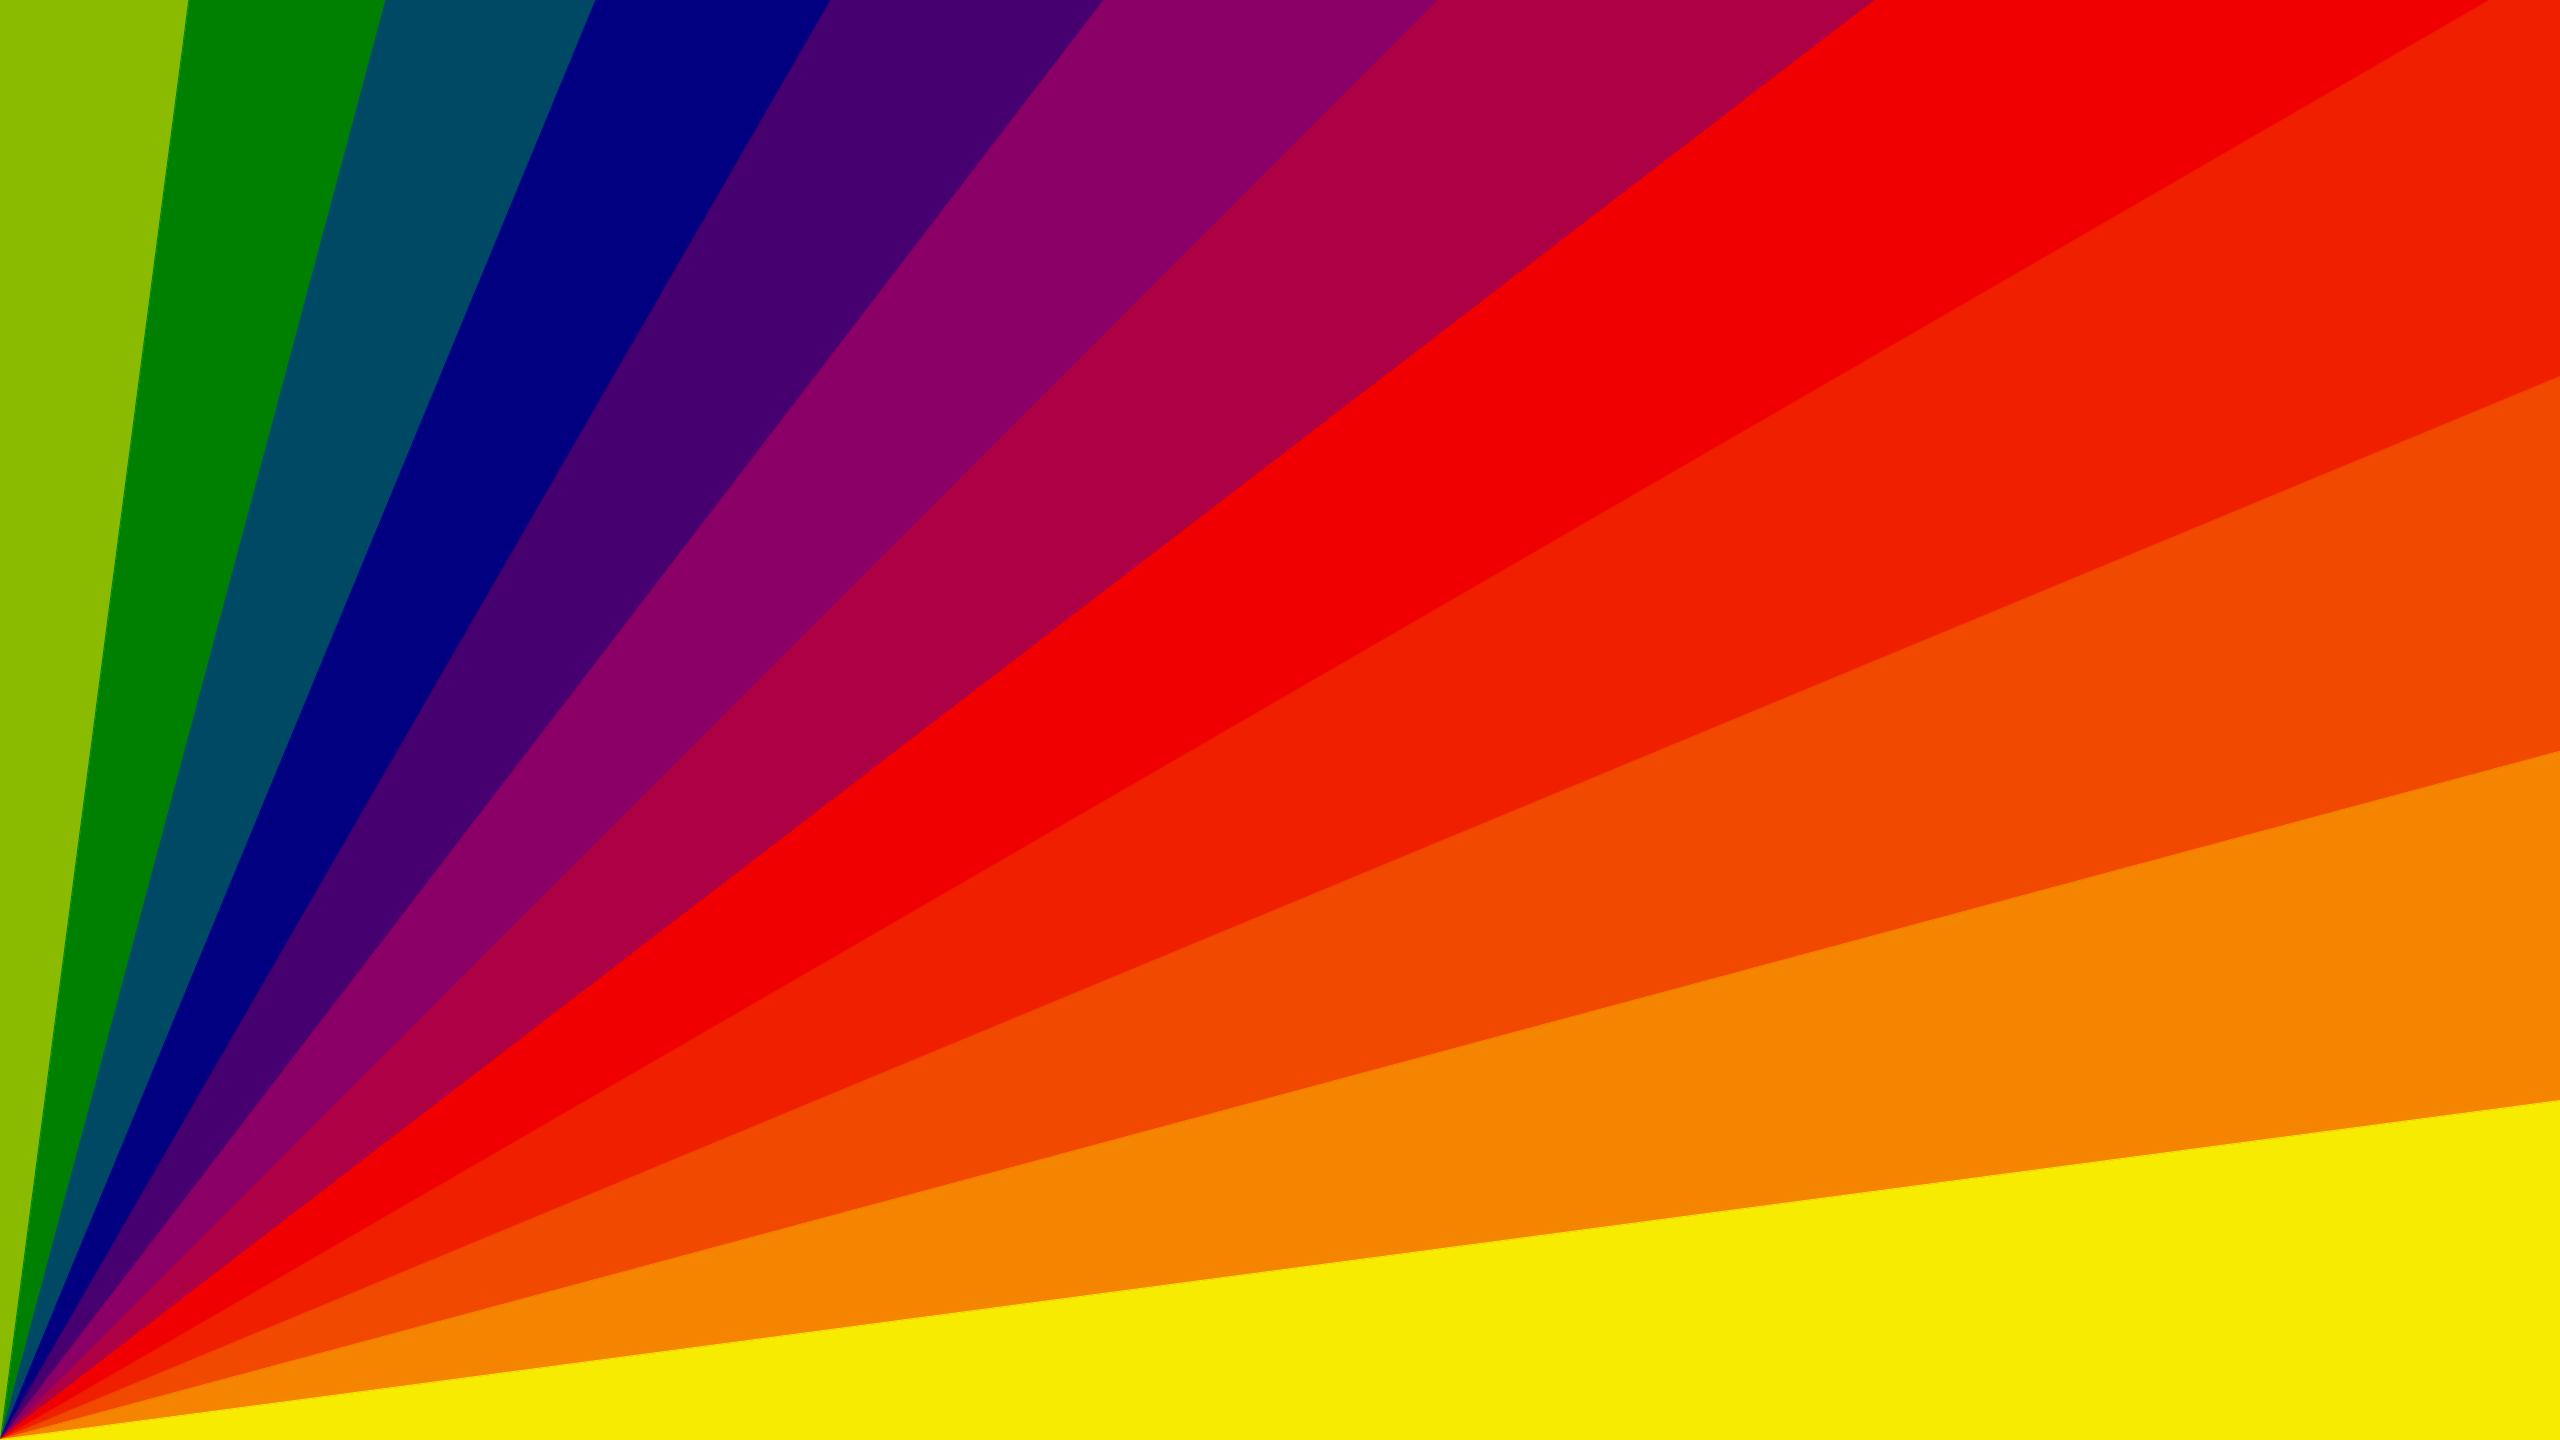 colores fondos de escritorio - photo #3